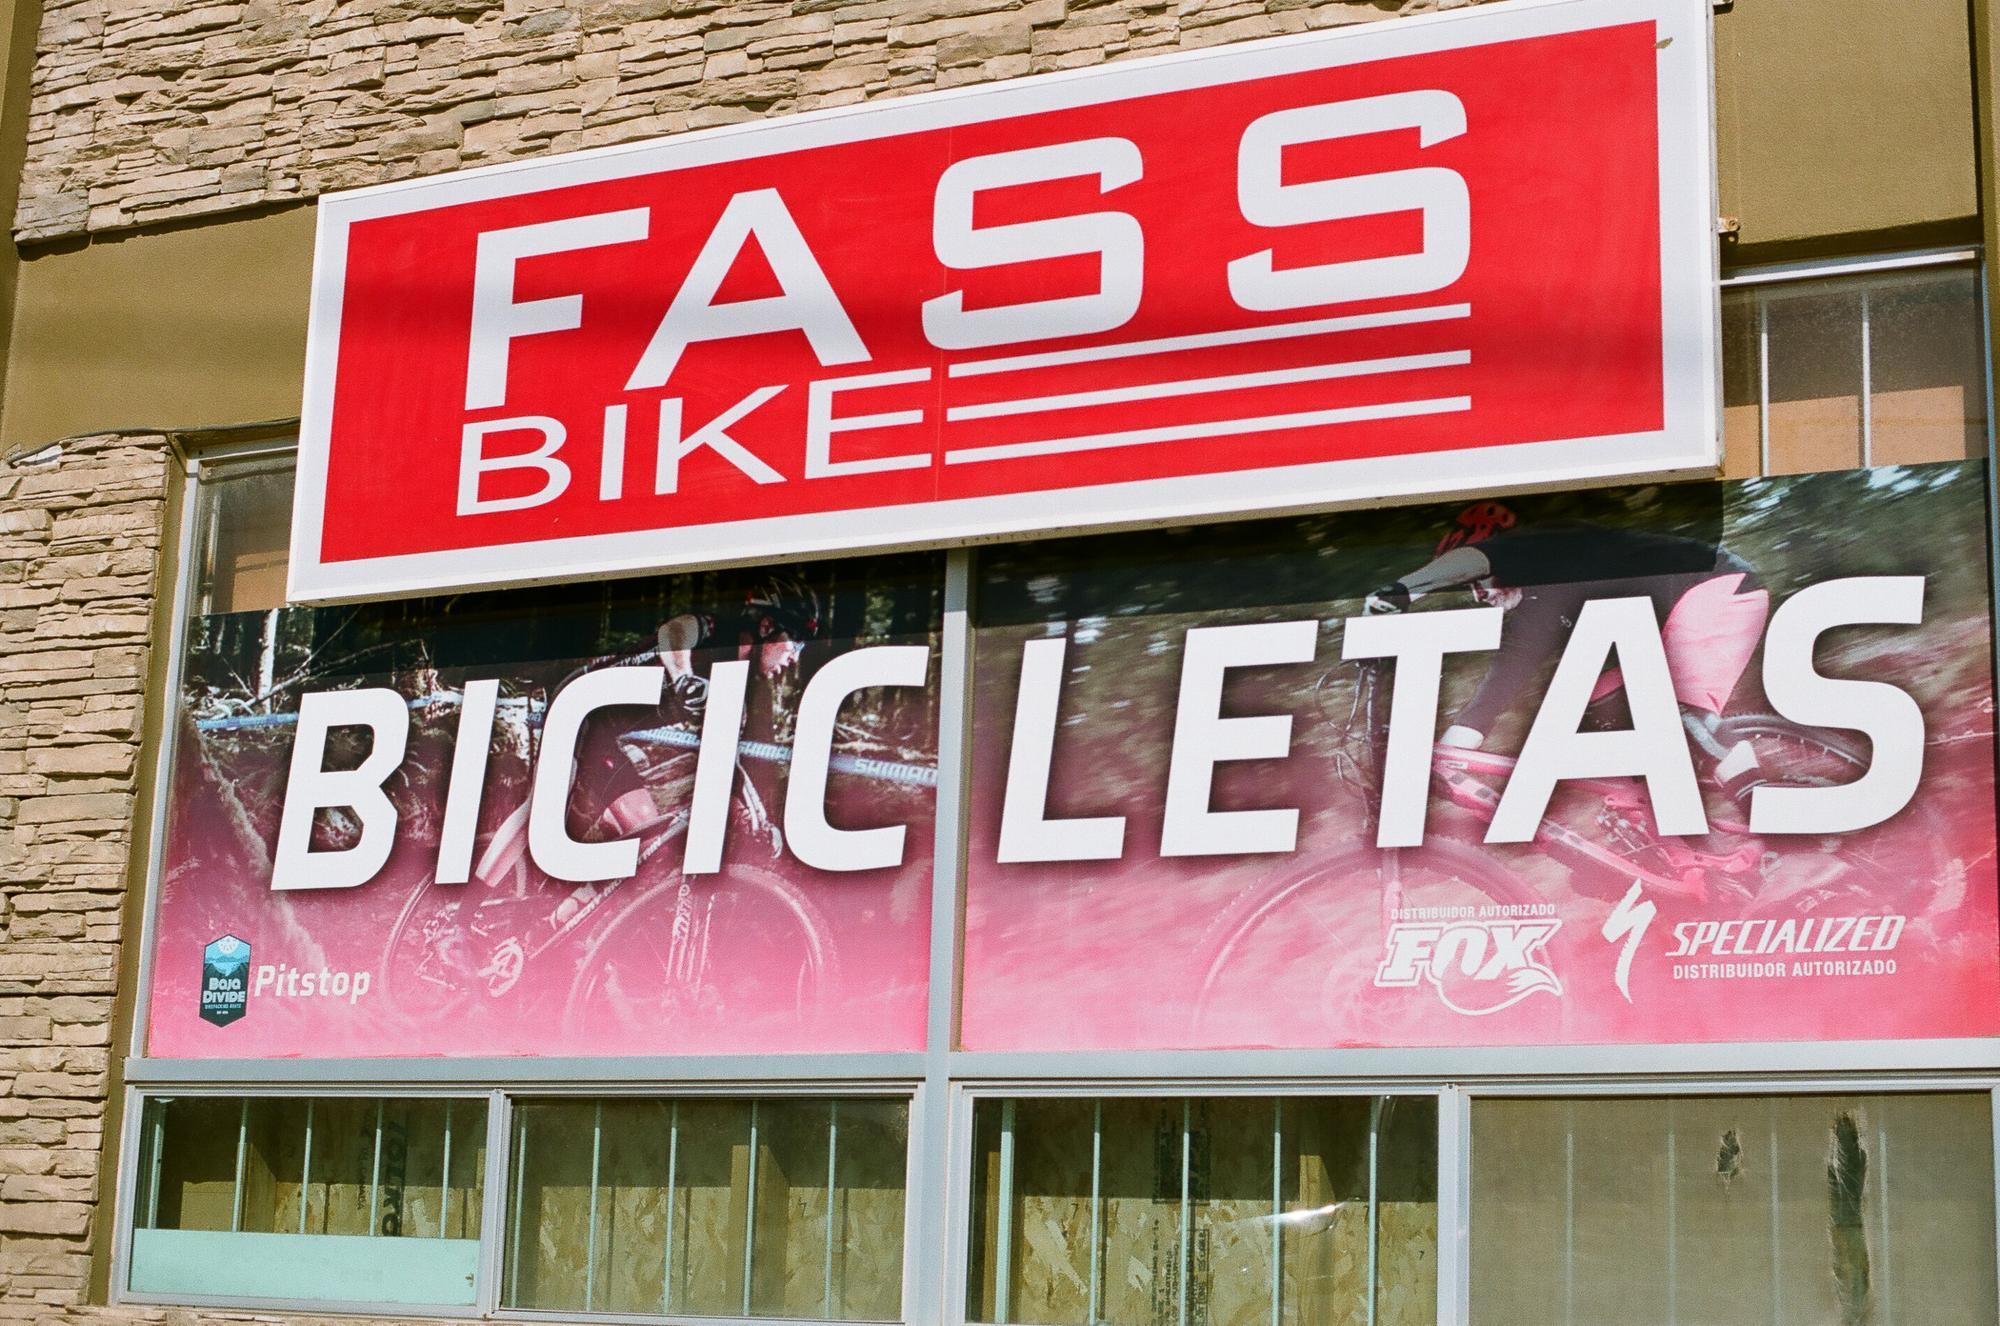 FASS Bike